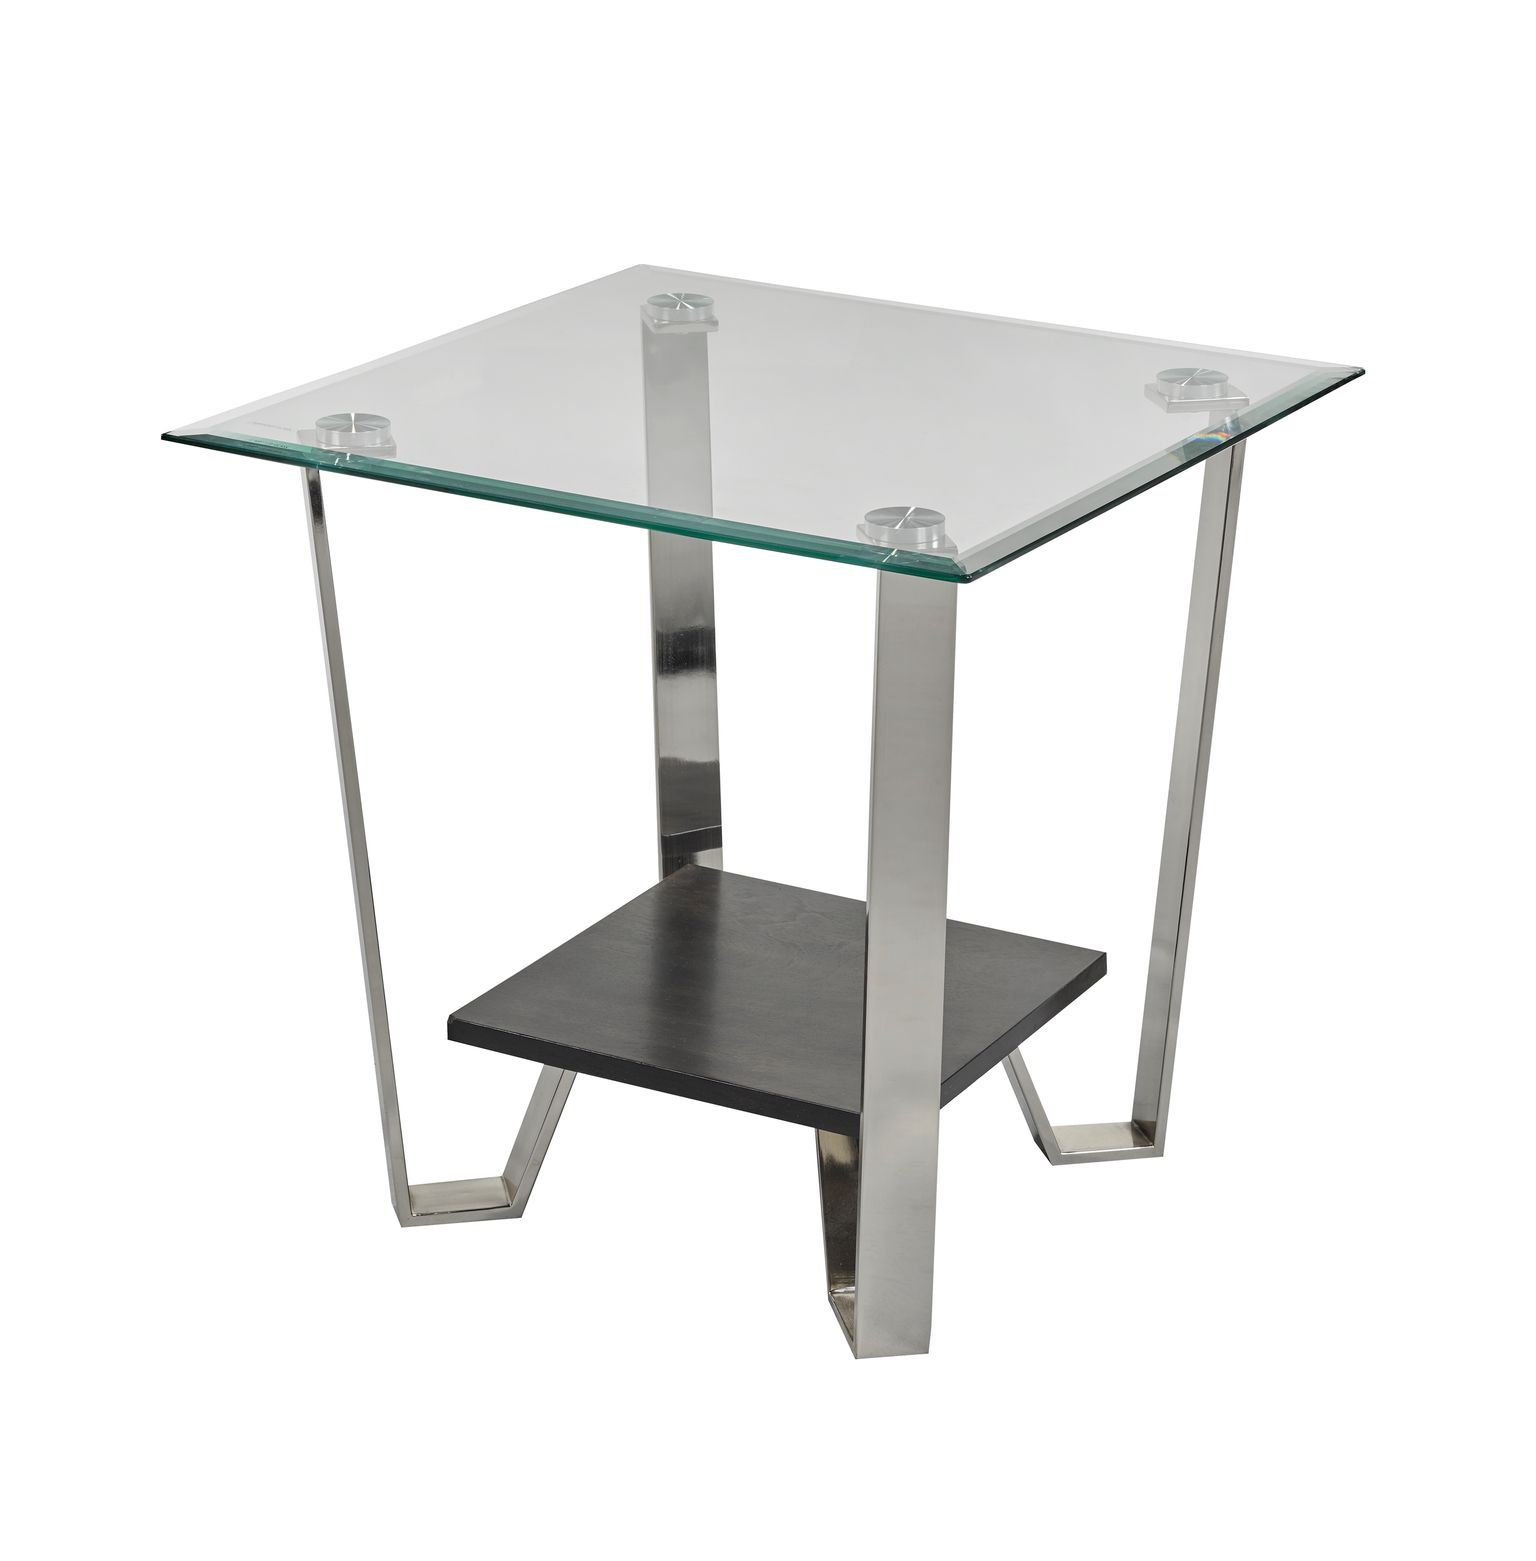 AVALON END TABLE ESPRESSO 24X24X24